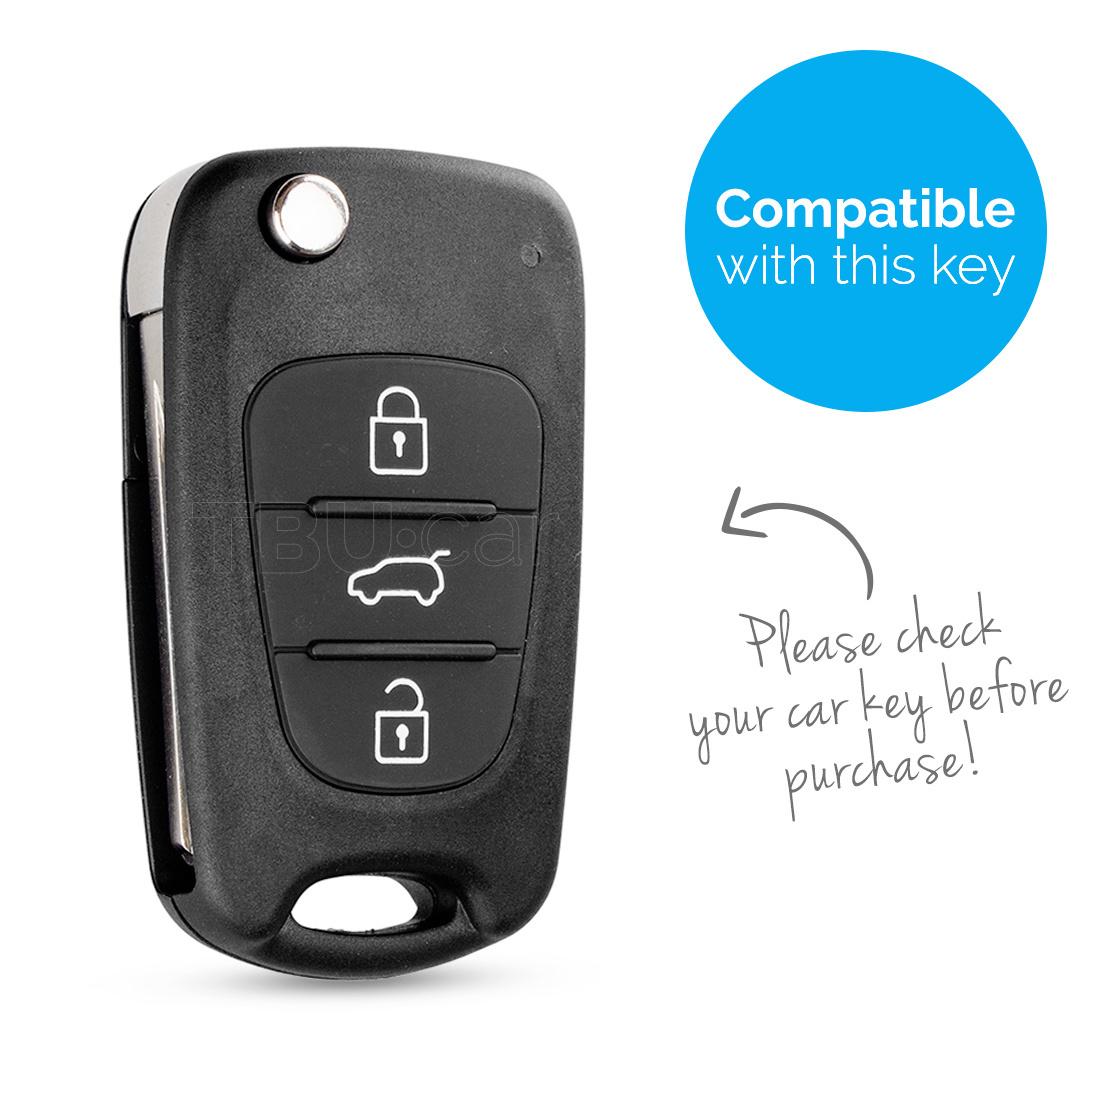 TBU car TBU car Autoschlüssel Hülle kompatibel mit Hyundai 3 Tasten - Schutzhülle aus Silikon - Auto Schlüsselhülle Cover in Rosa